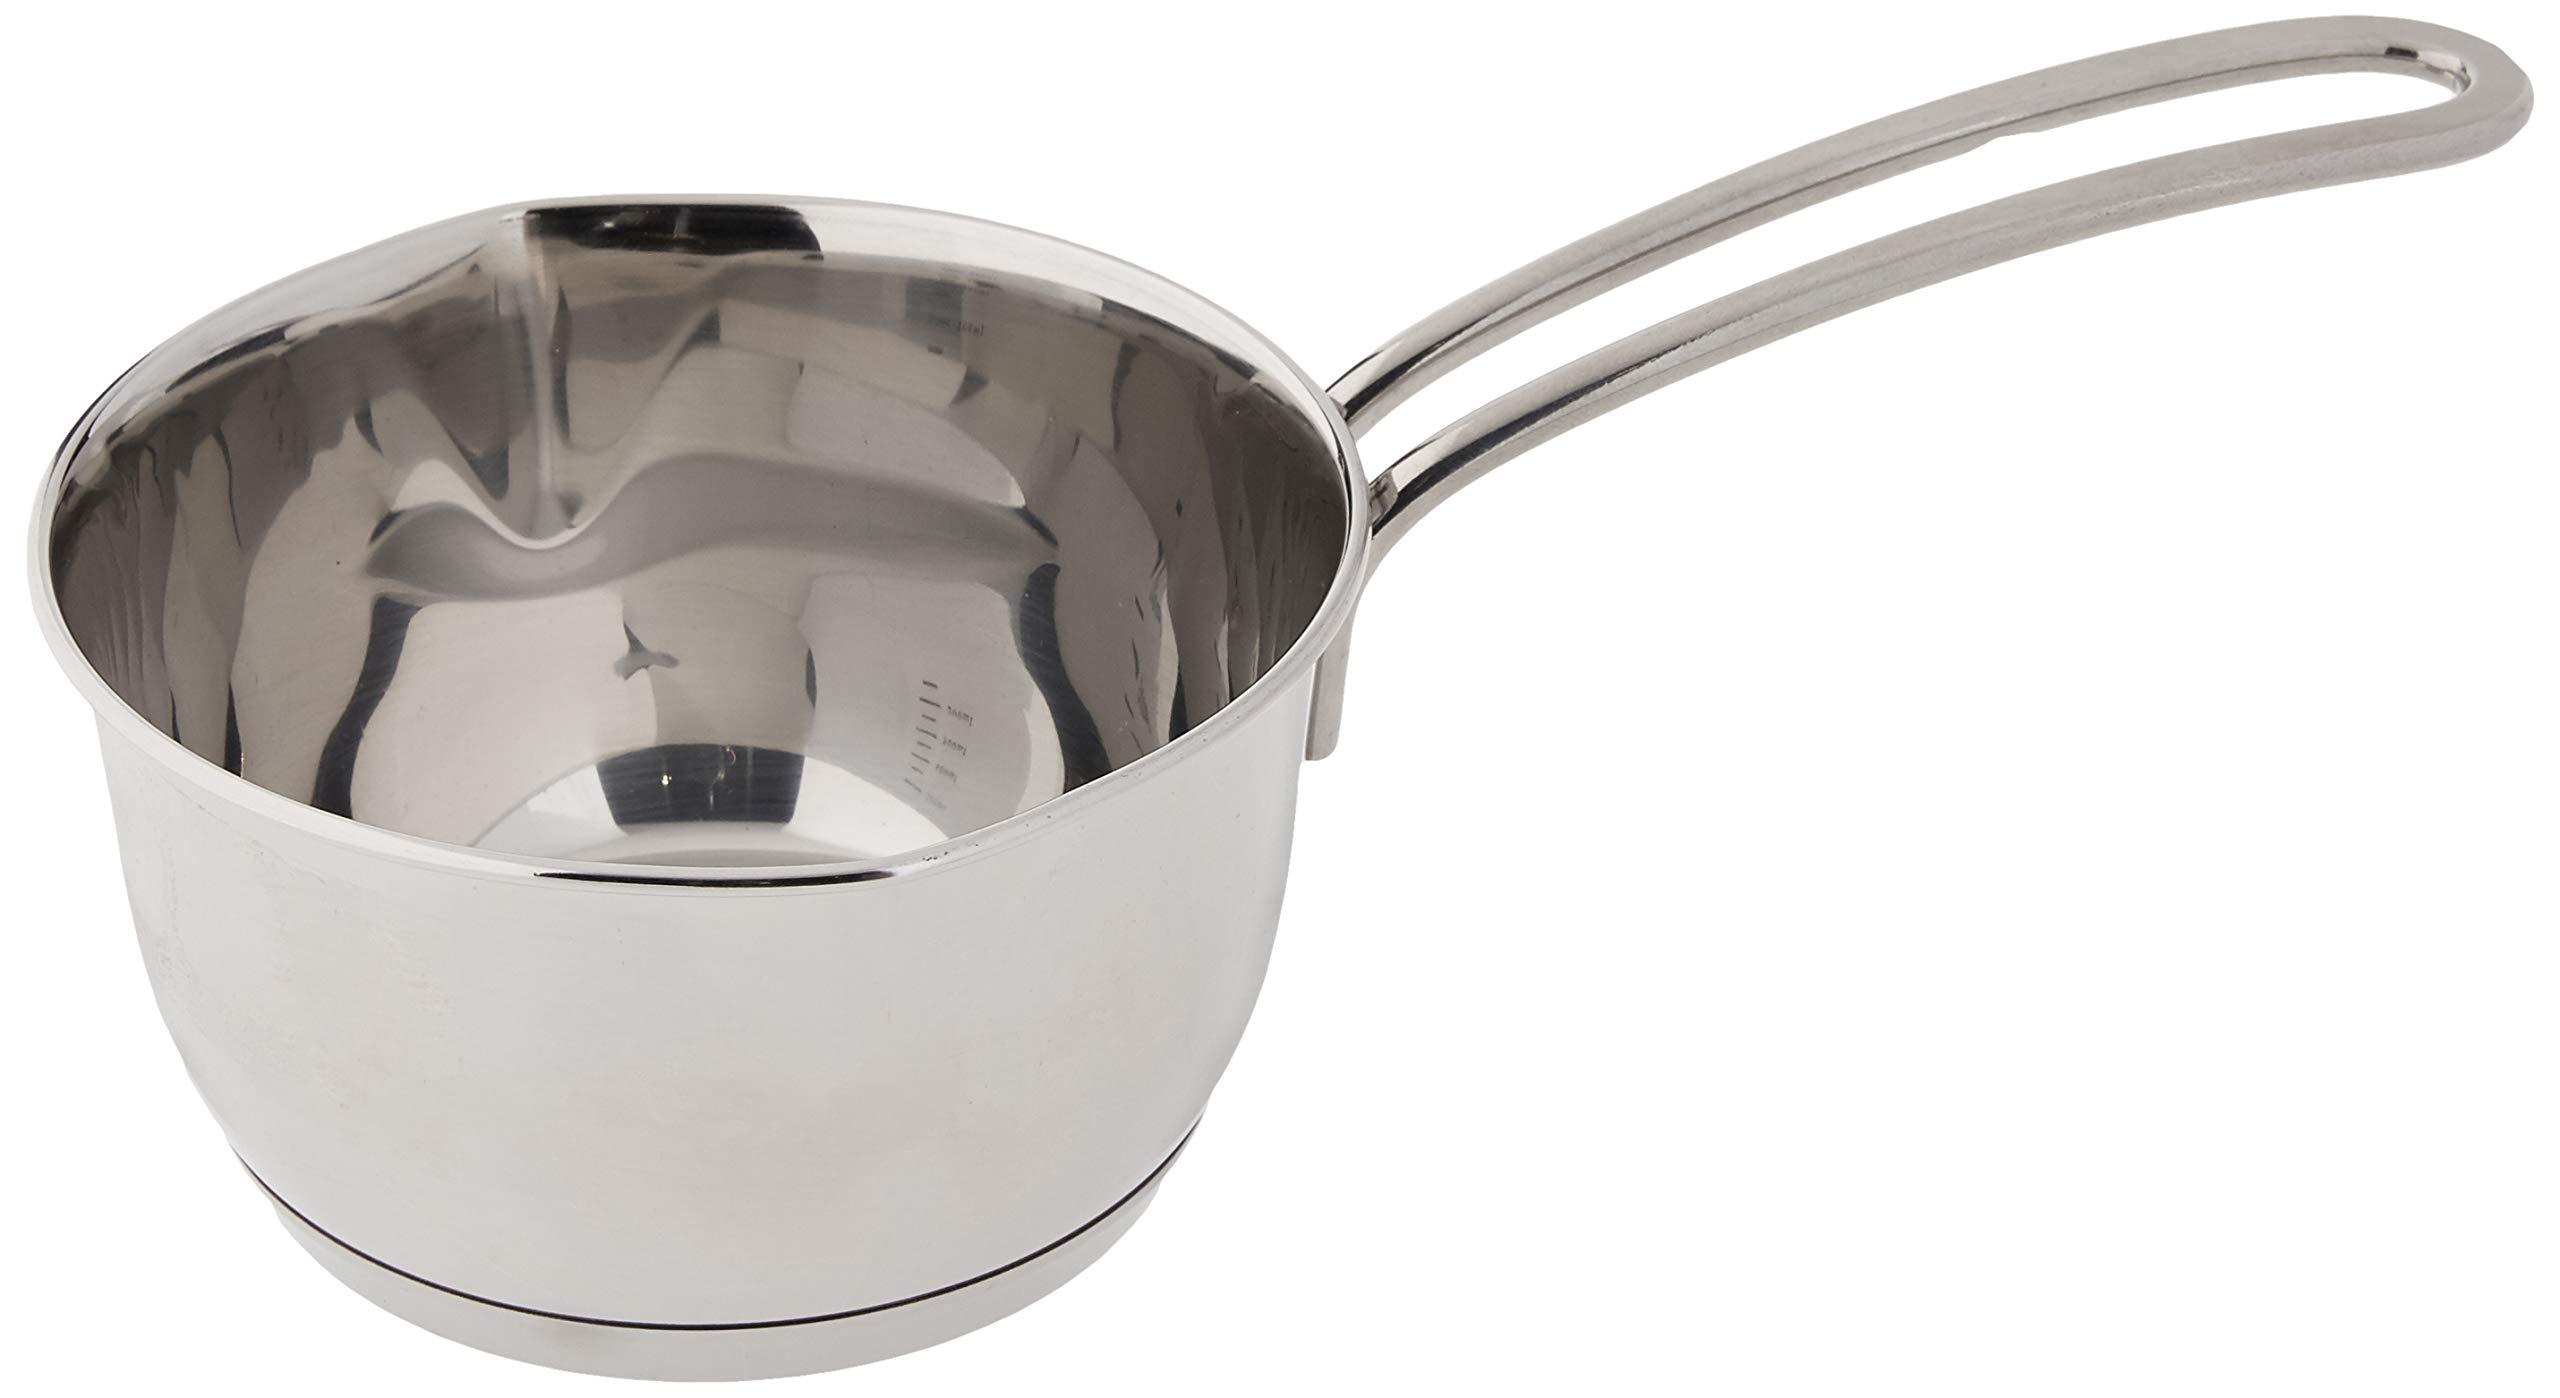 Kuchenprofi Stainless Steel Saucepan with Clad Bottom, 16-Ounce by Kuchenprofi